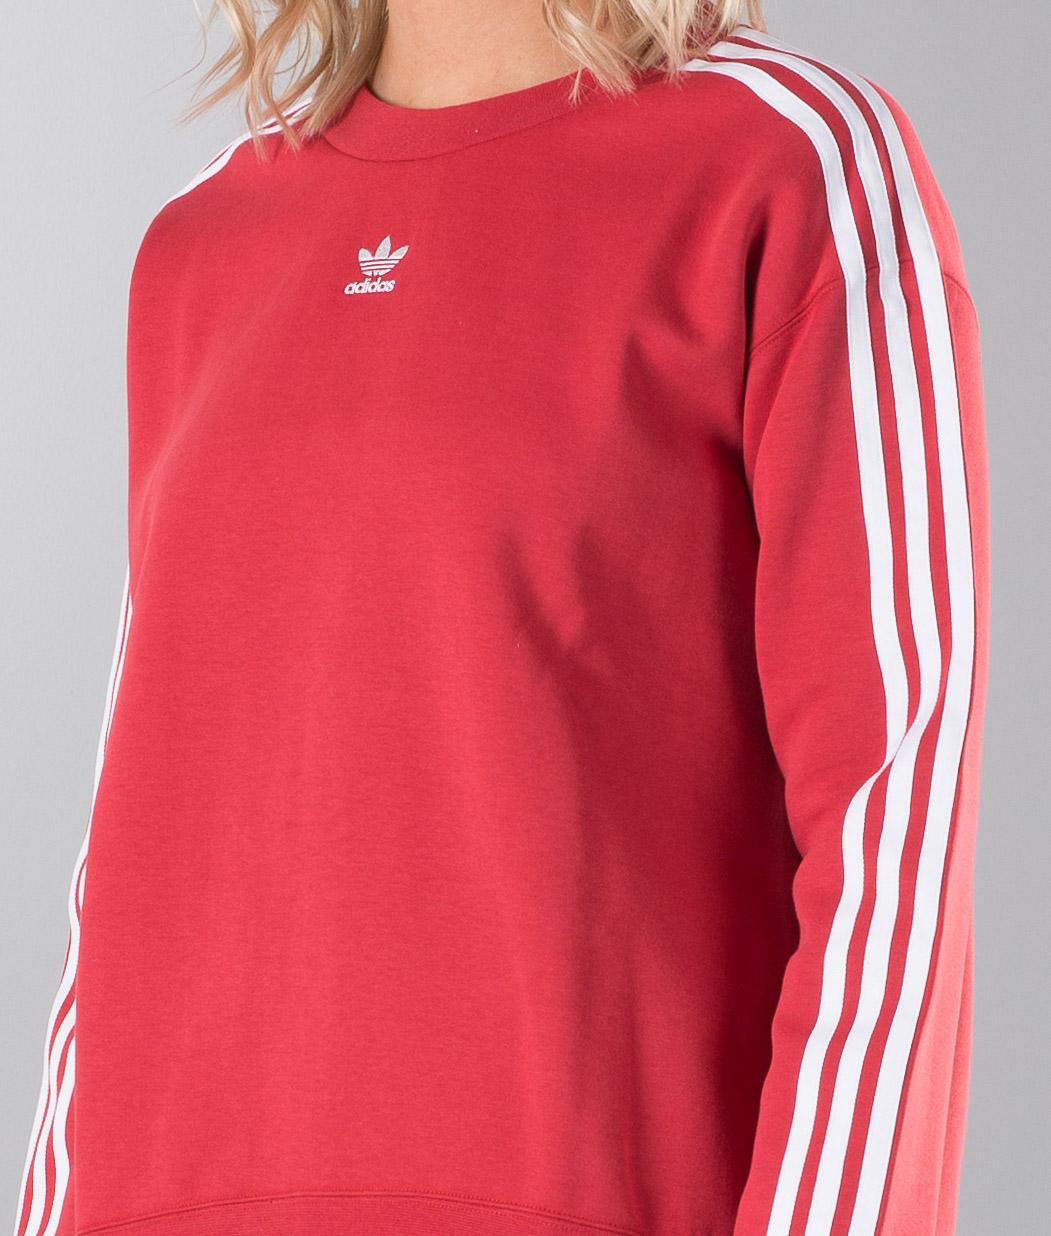 Sweater Red Crew Adidas Originals Raw nOPk0w